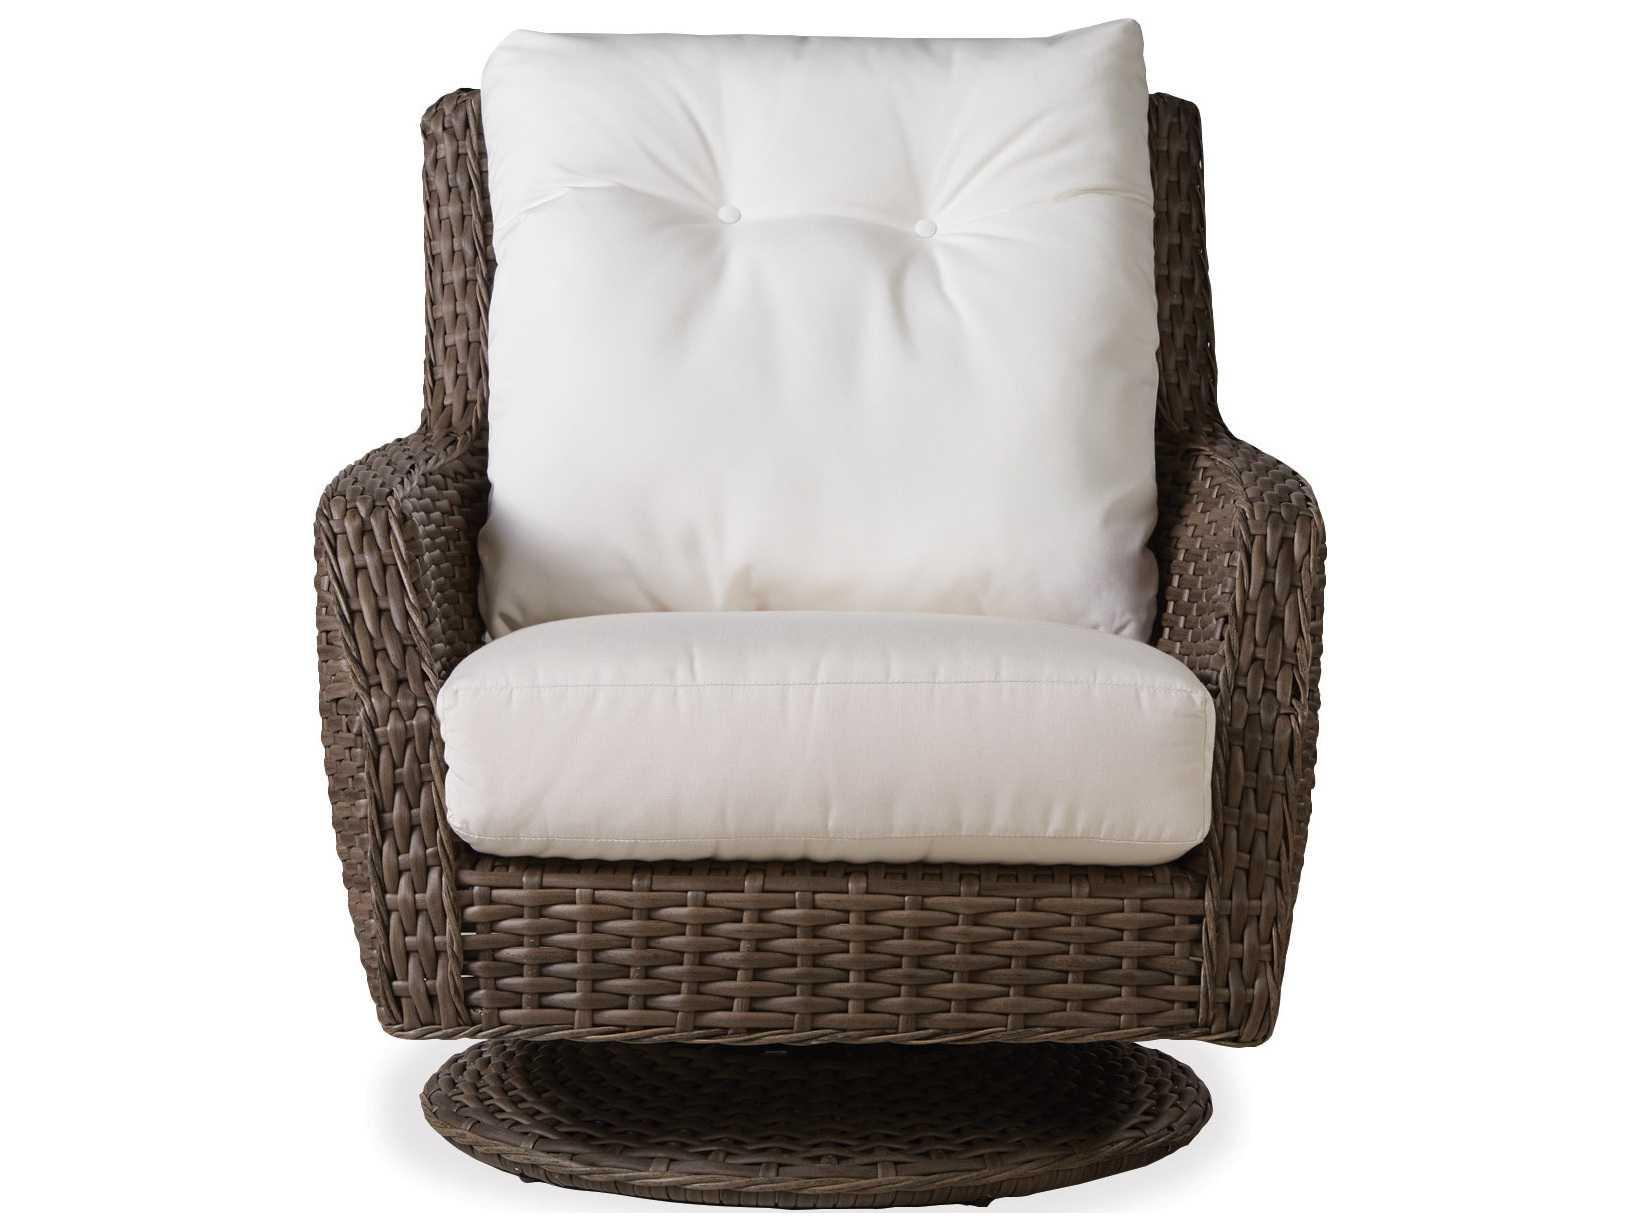 48 high back outdoor chair cushions hardwood floor office mat lloyd flanders largo replacement swivel rocker